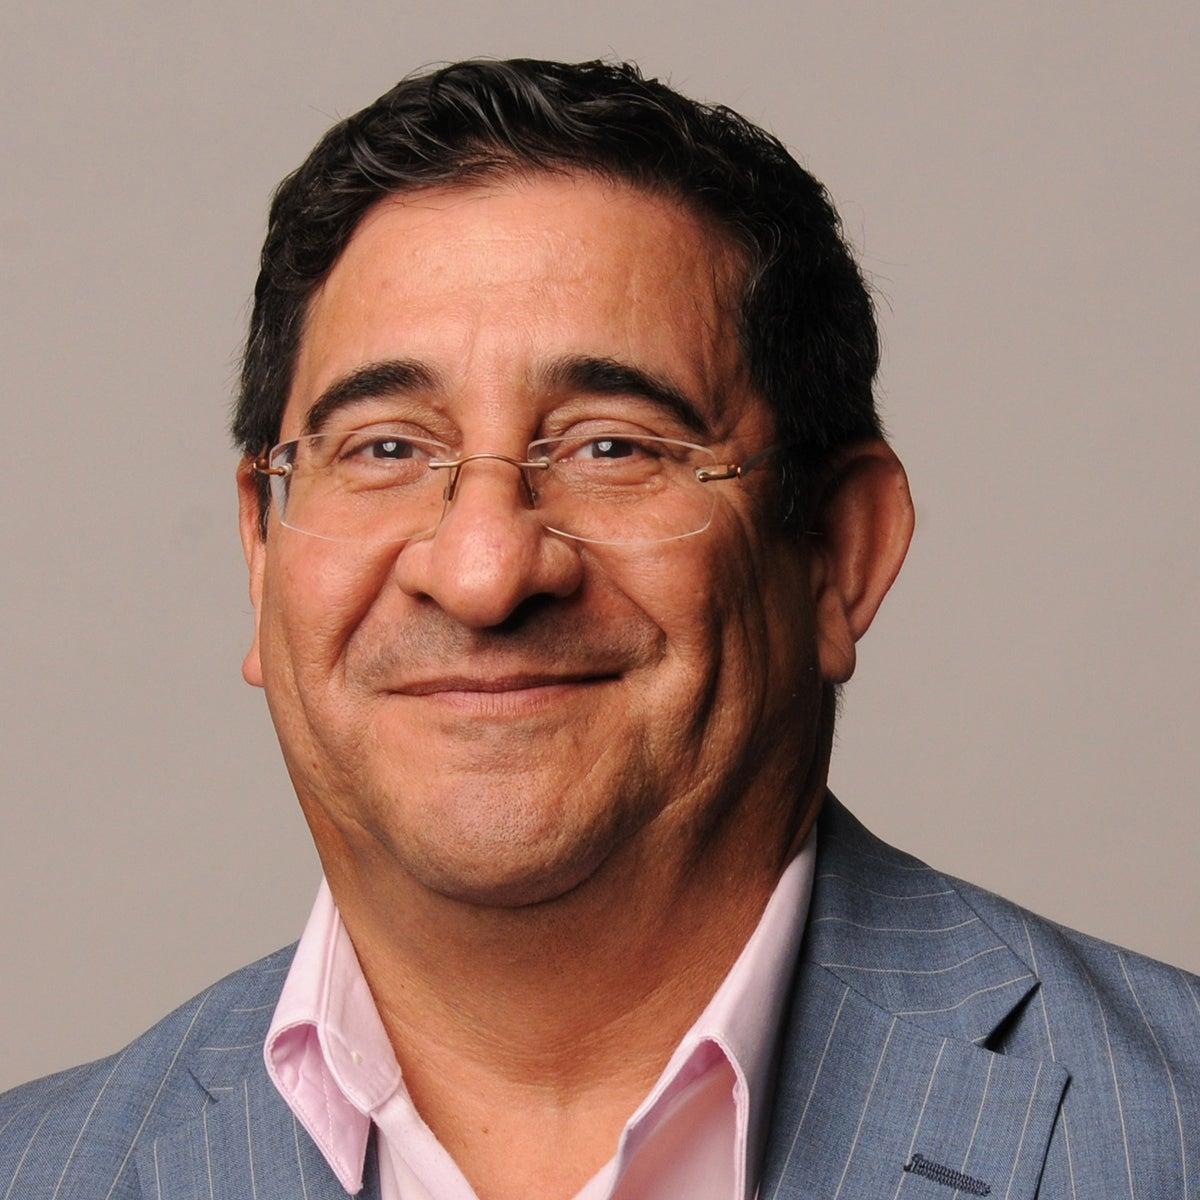 Gilberto Chona